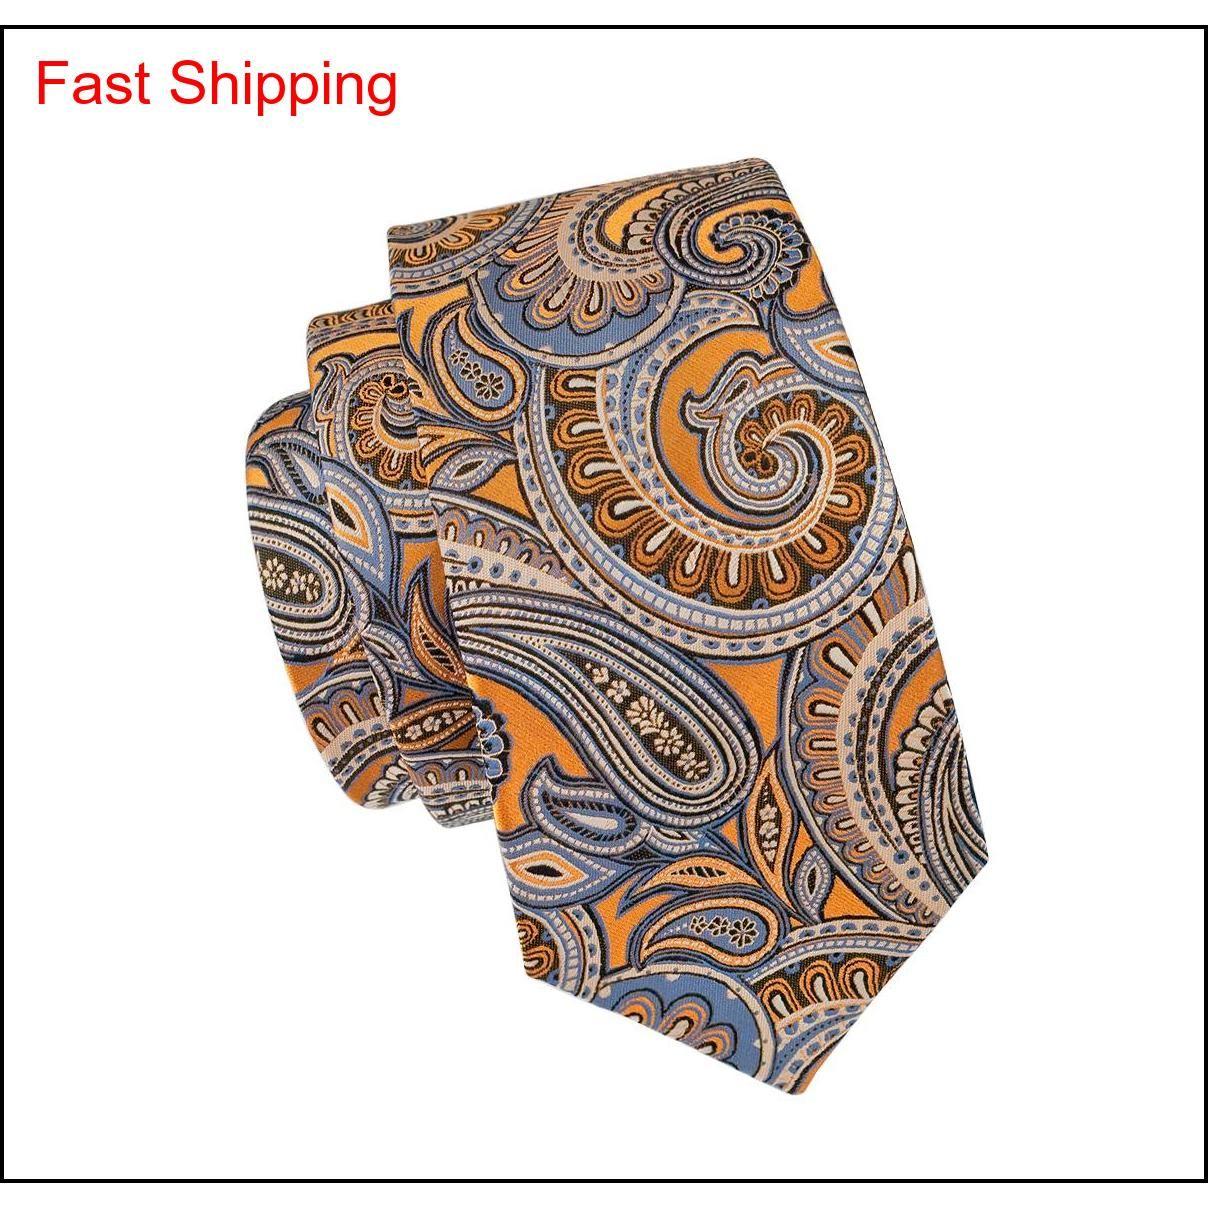 Classic Seta Ties Ties Paisley Tie Sets Orange Mens Cravatte cravatta Tie Hanky Gemelli Jacquard Meeting Affari Affari We Qylxpp Beauty888